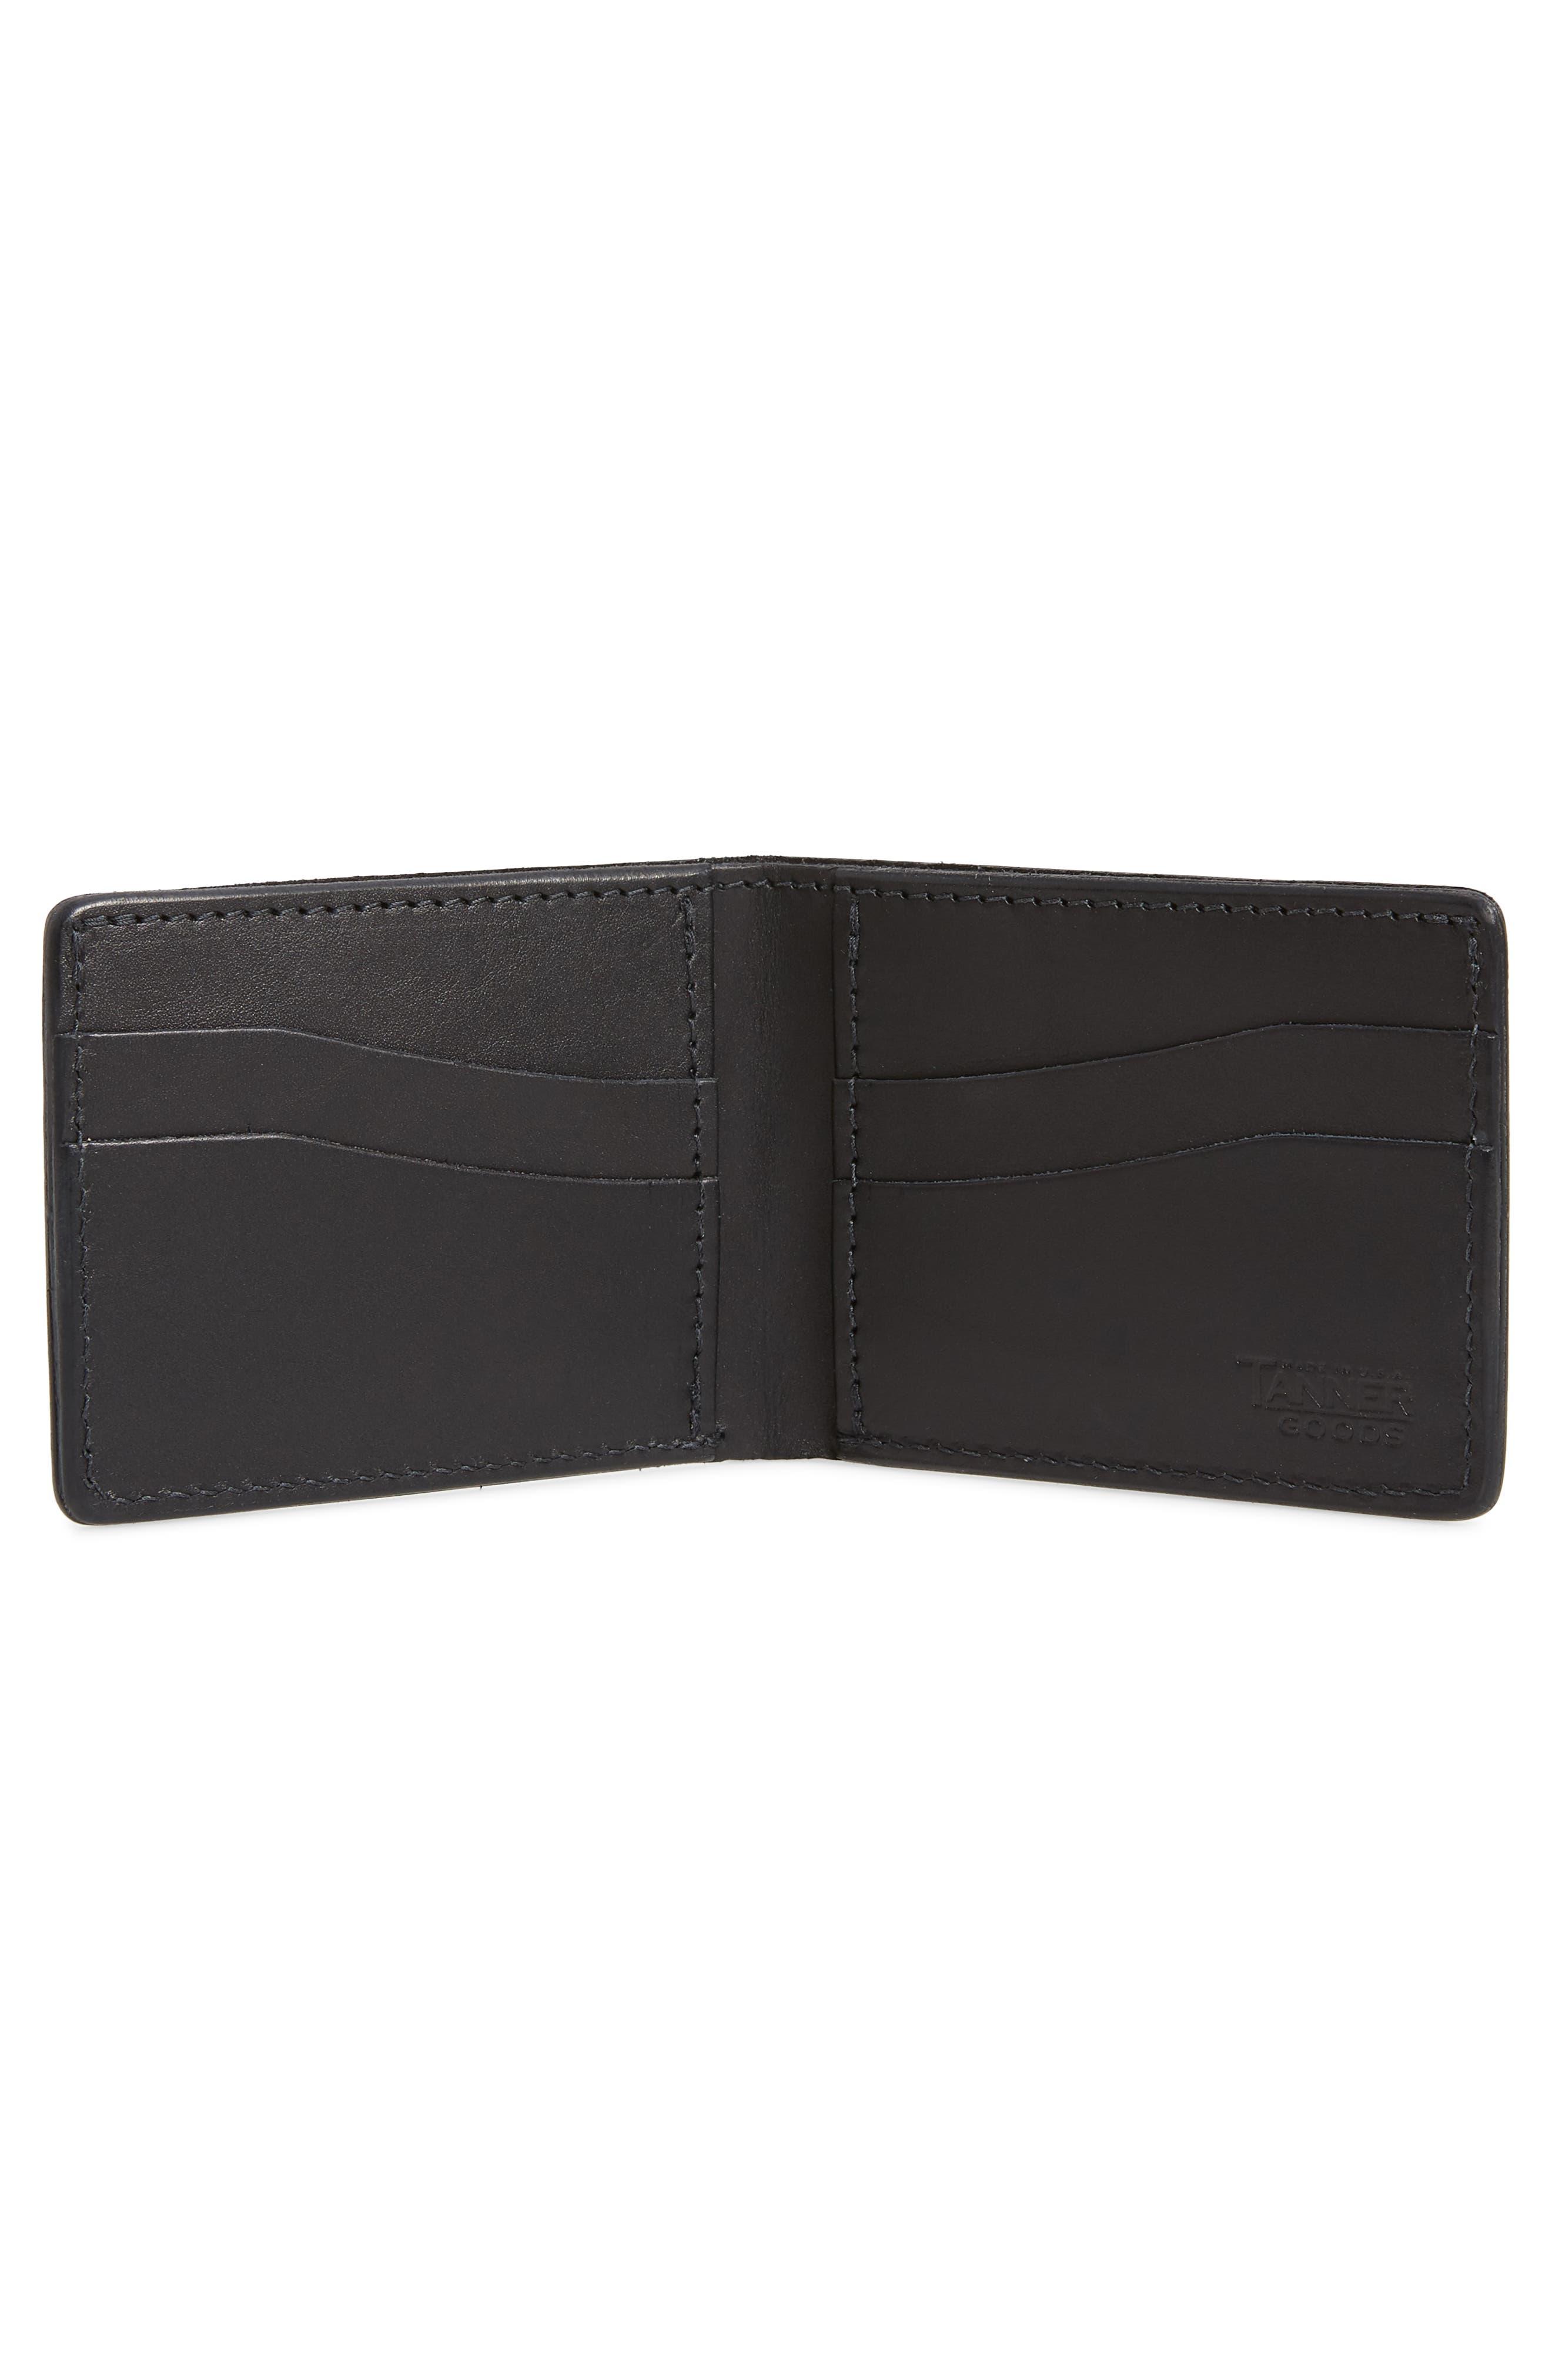 Utility Leather Bifold Wallet,                             Alternate thumbnail 3, color,                             Black